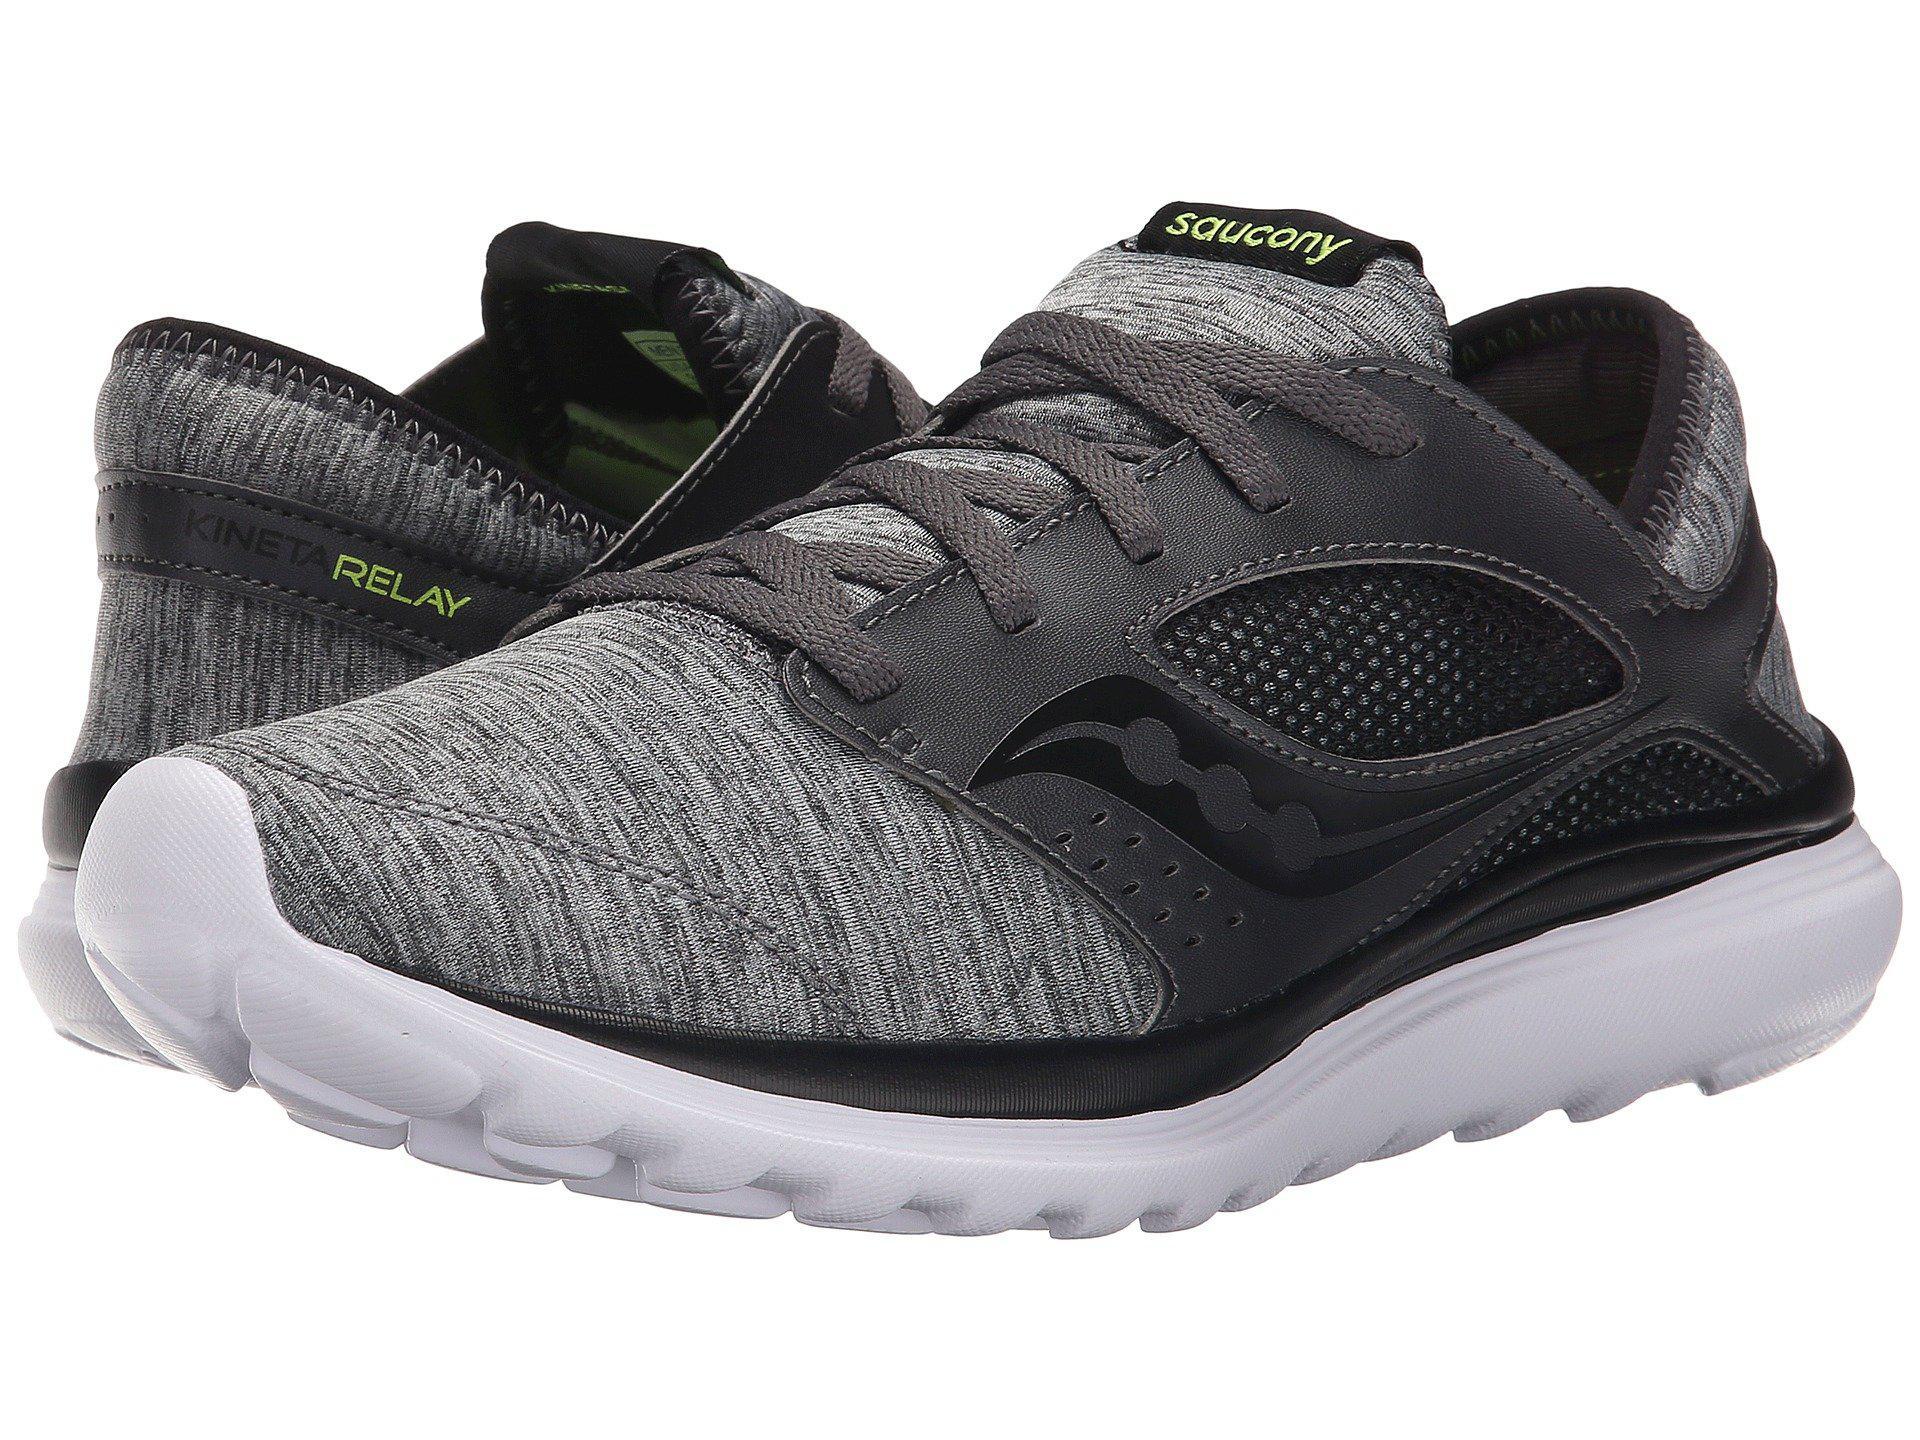 Saucony / Kineta Relay Shoes / HEATHER/BLACK